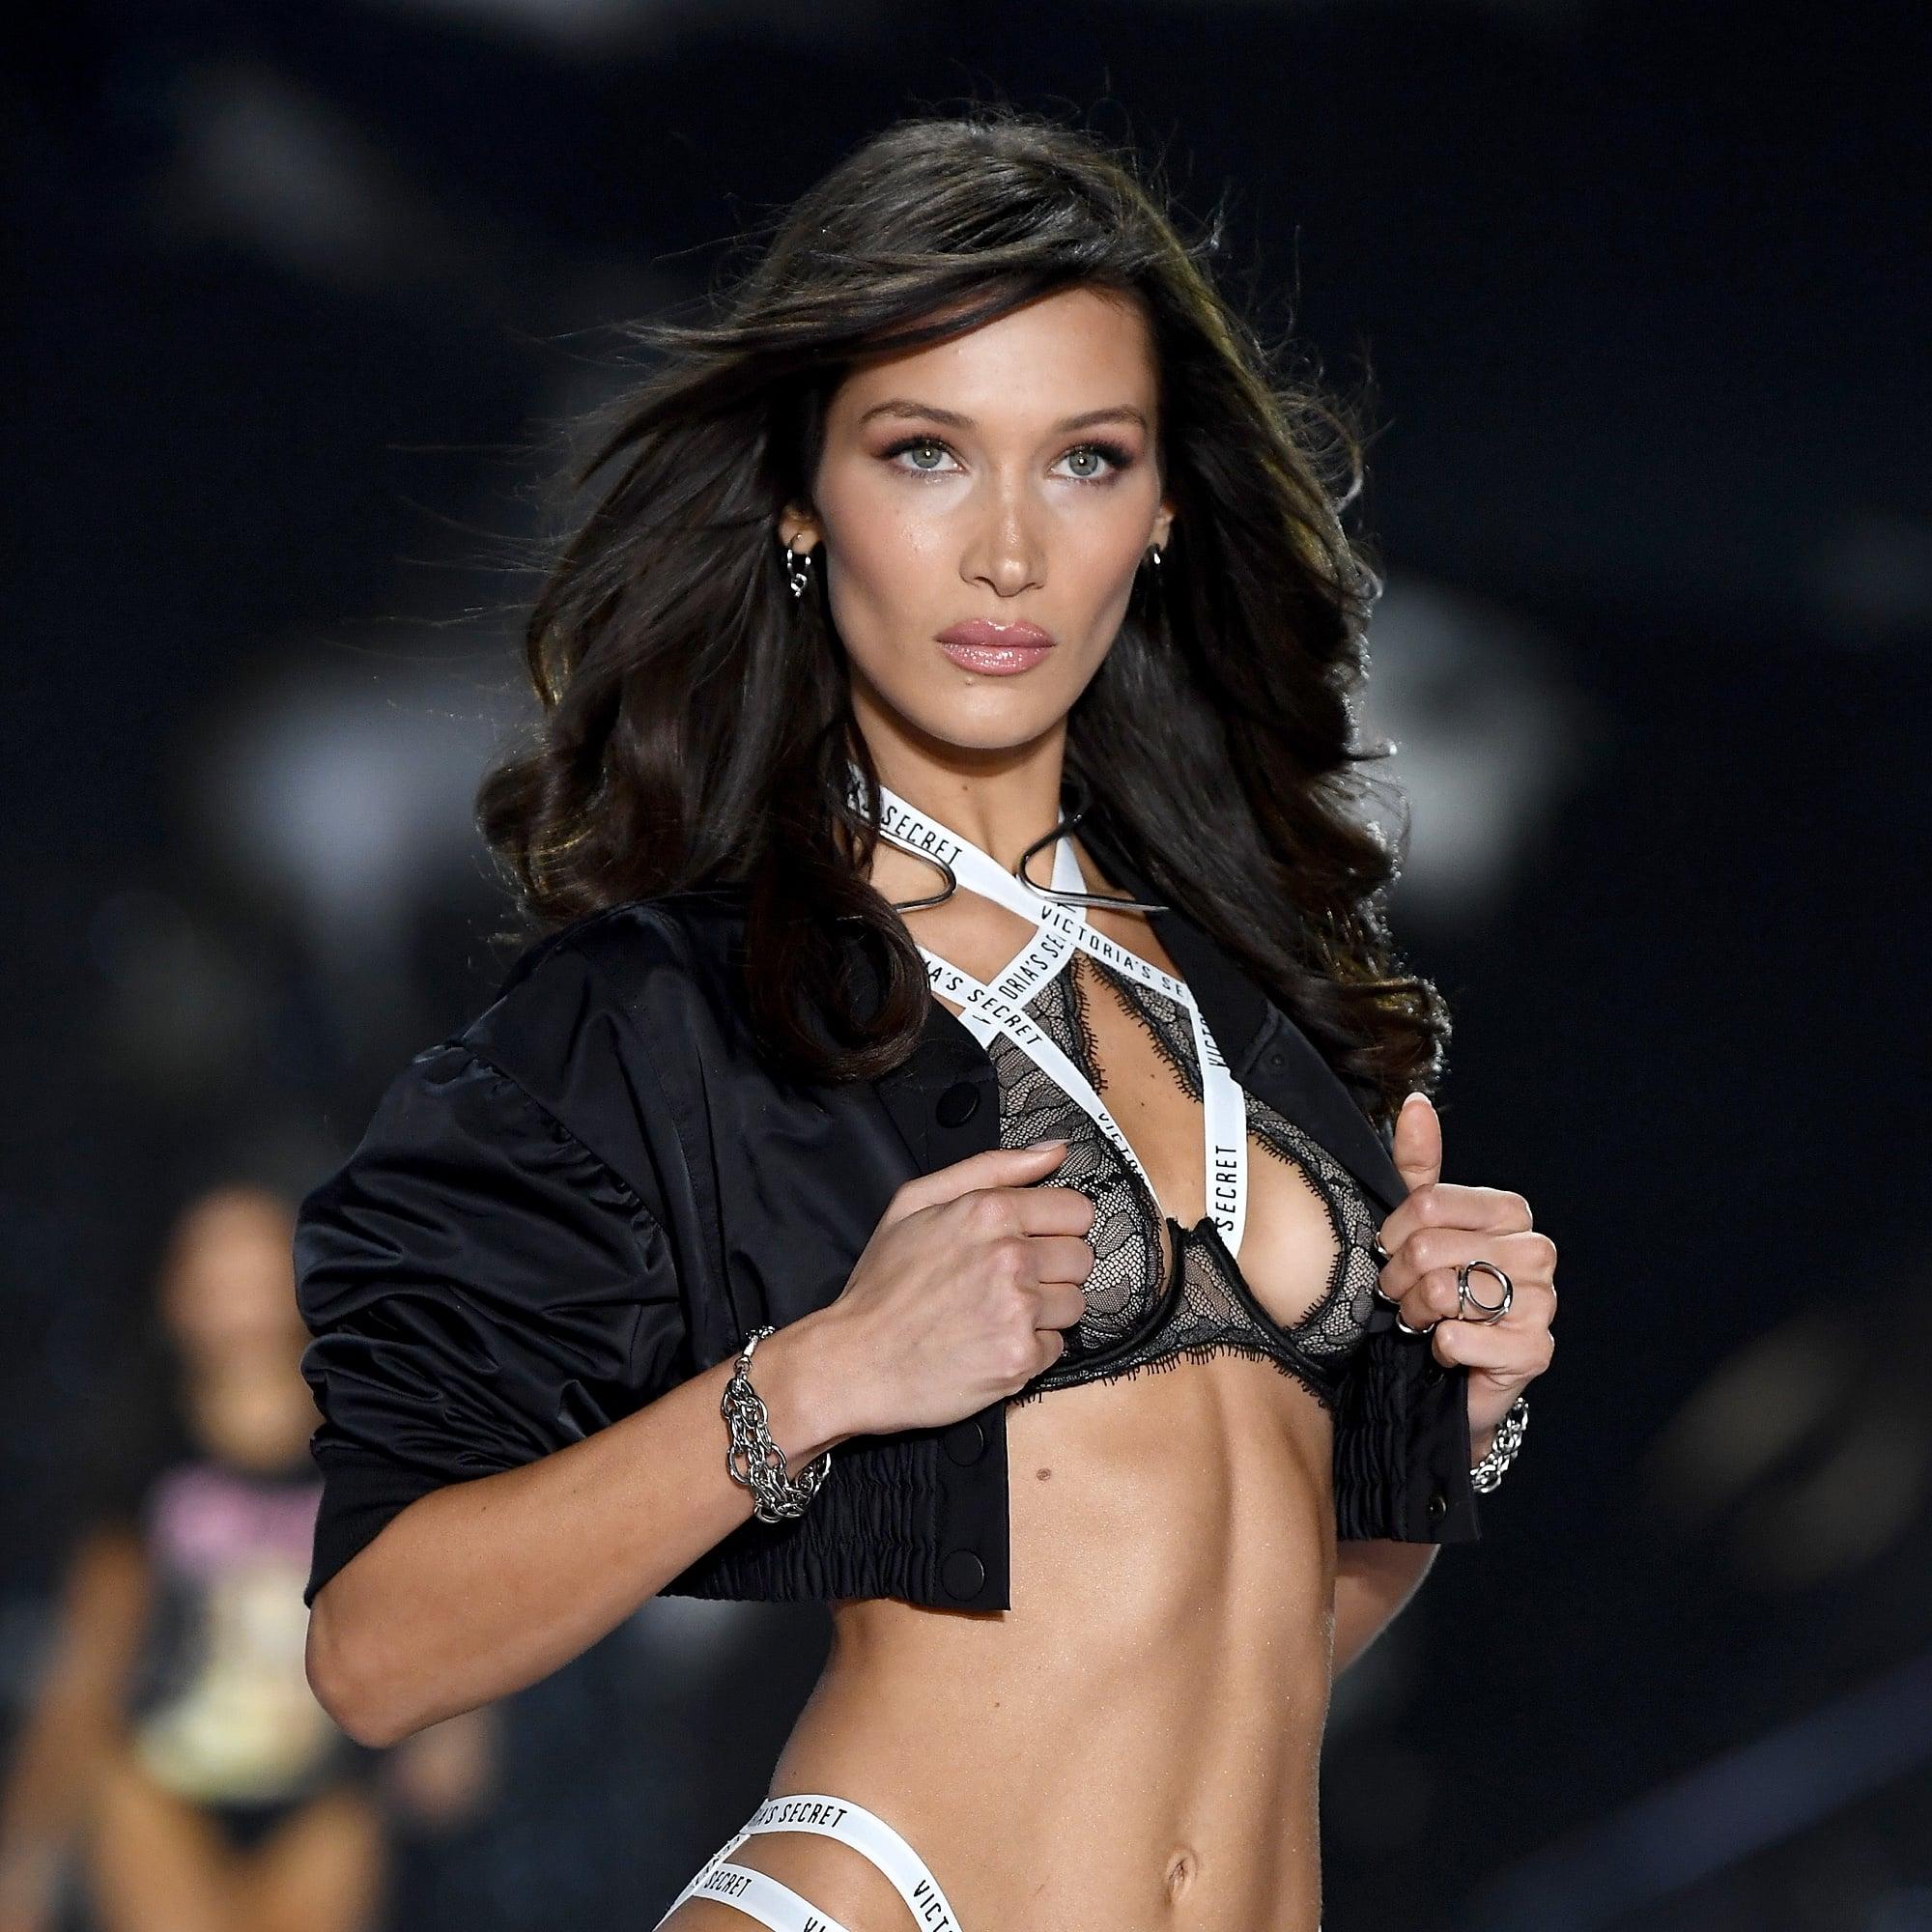 nudes (35 photos), Bikini Celebrity photos